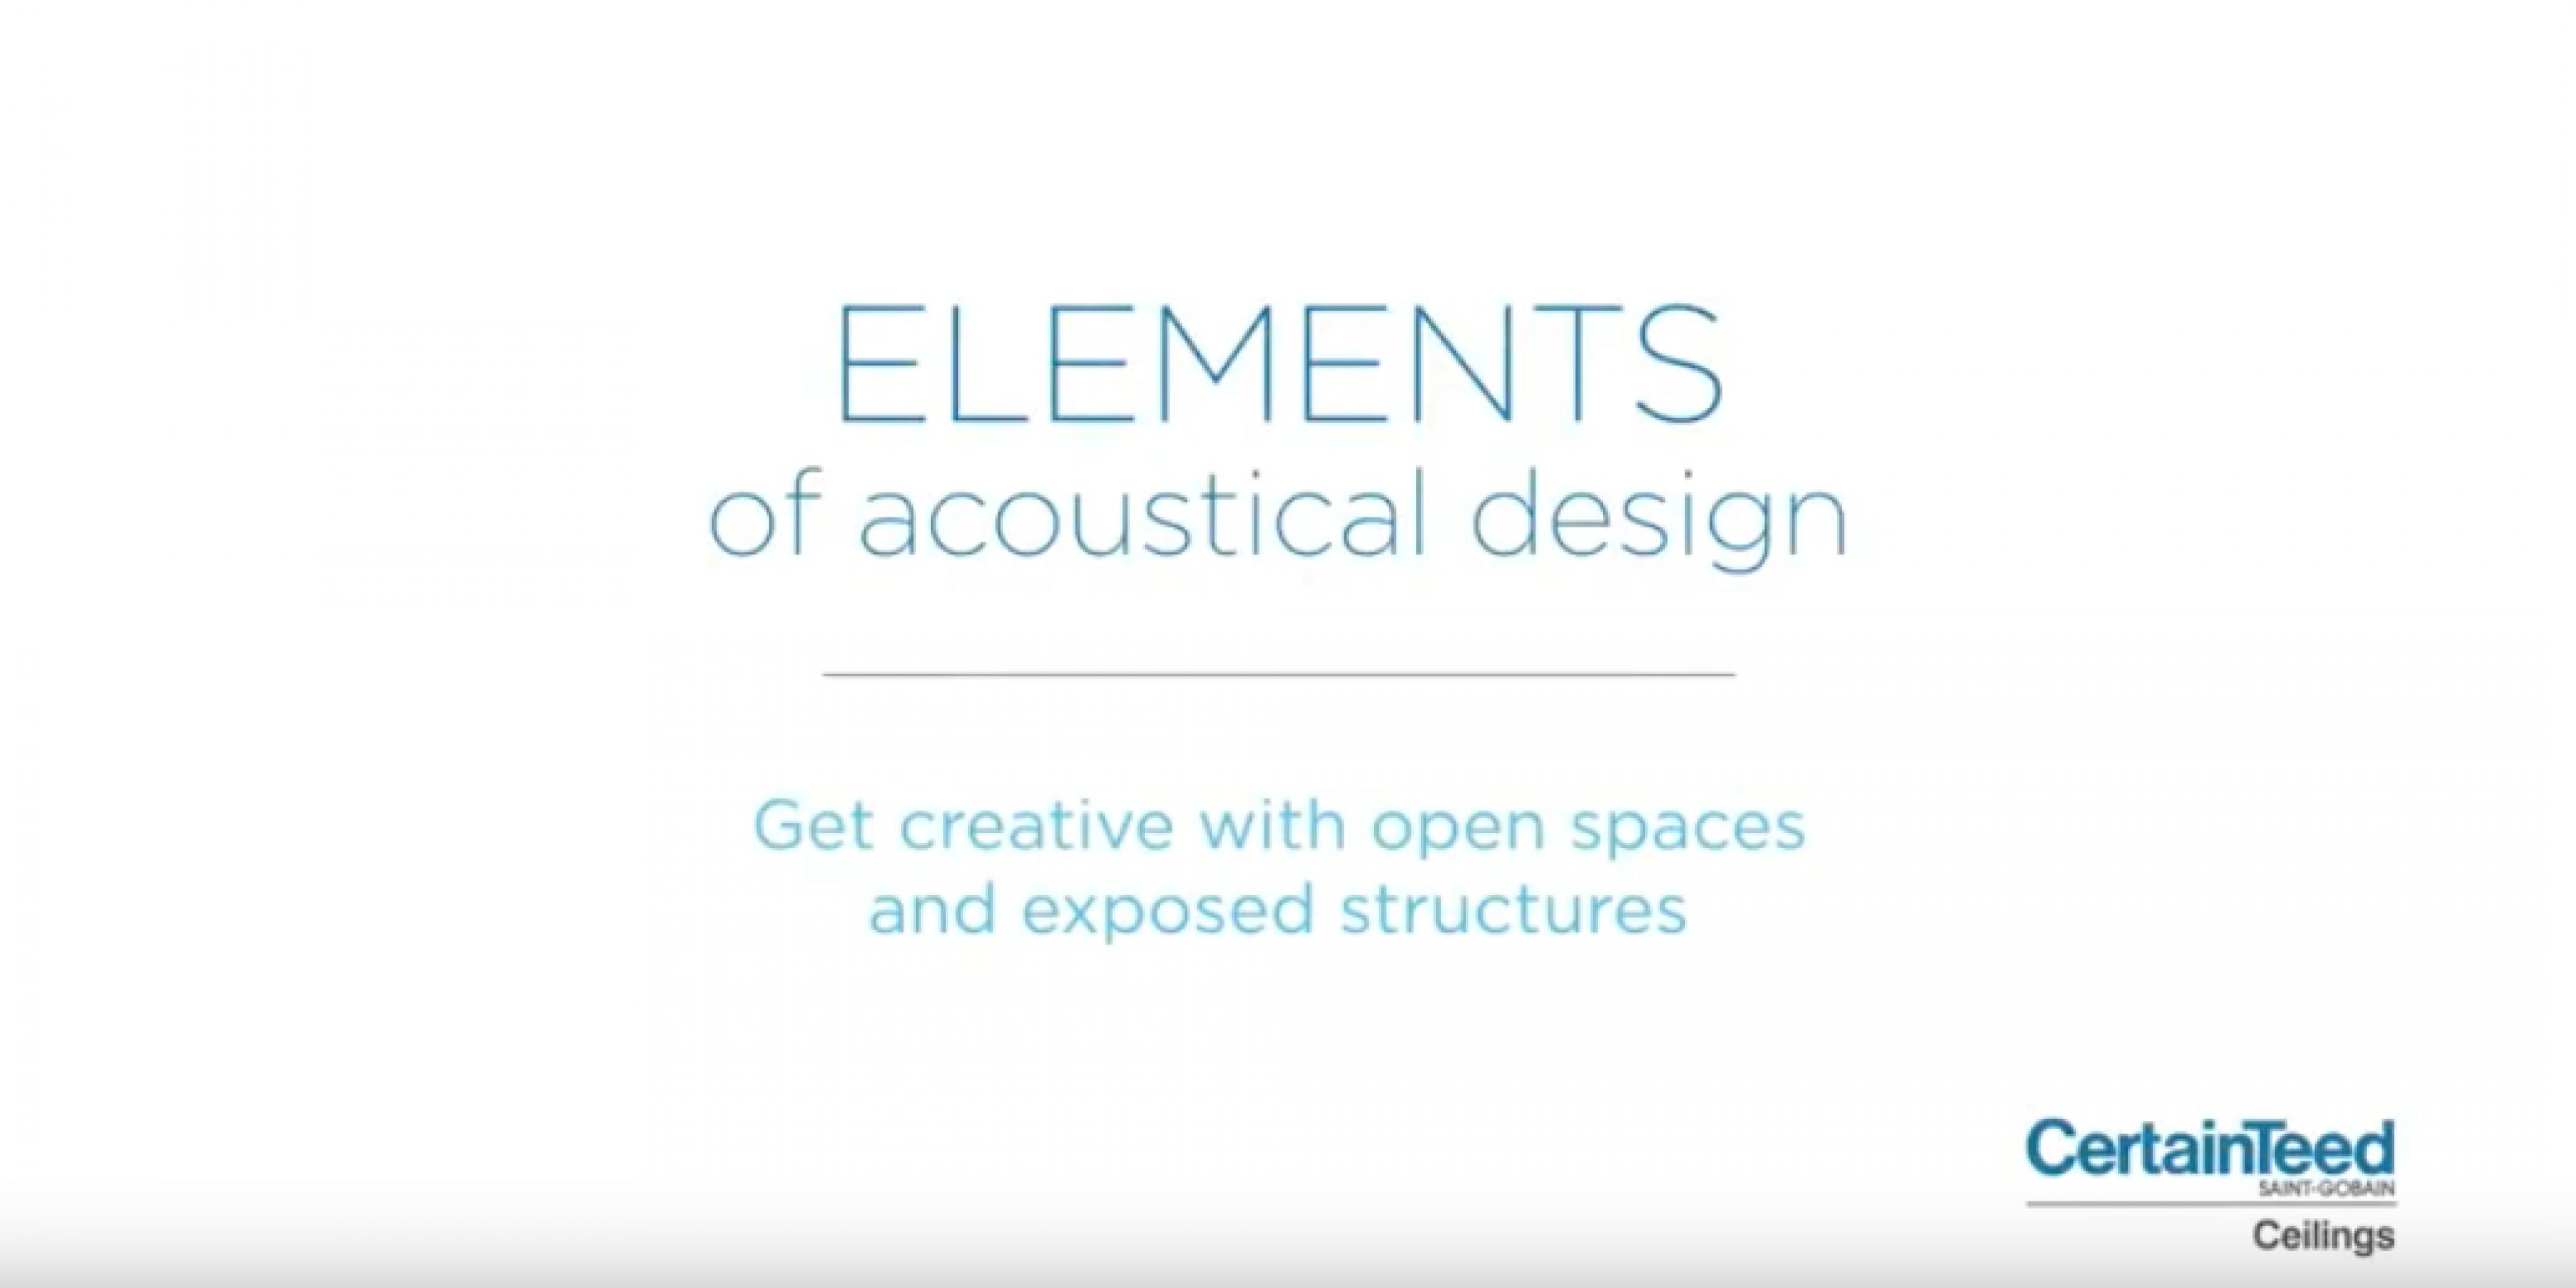 Elements of Acoustical Ceiling Design